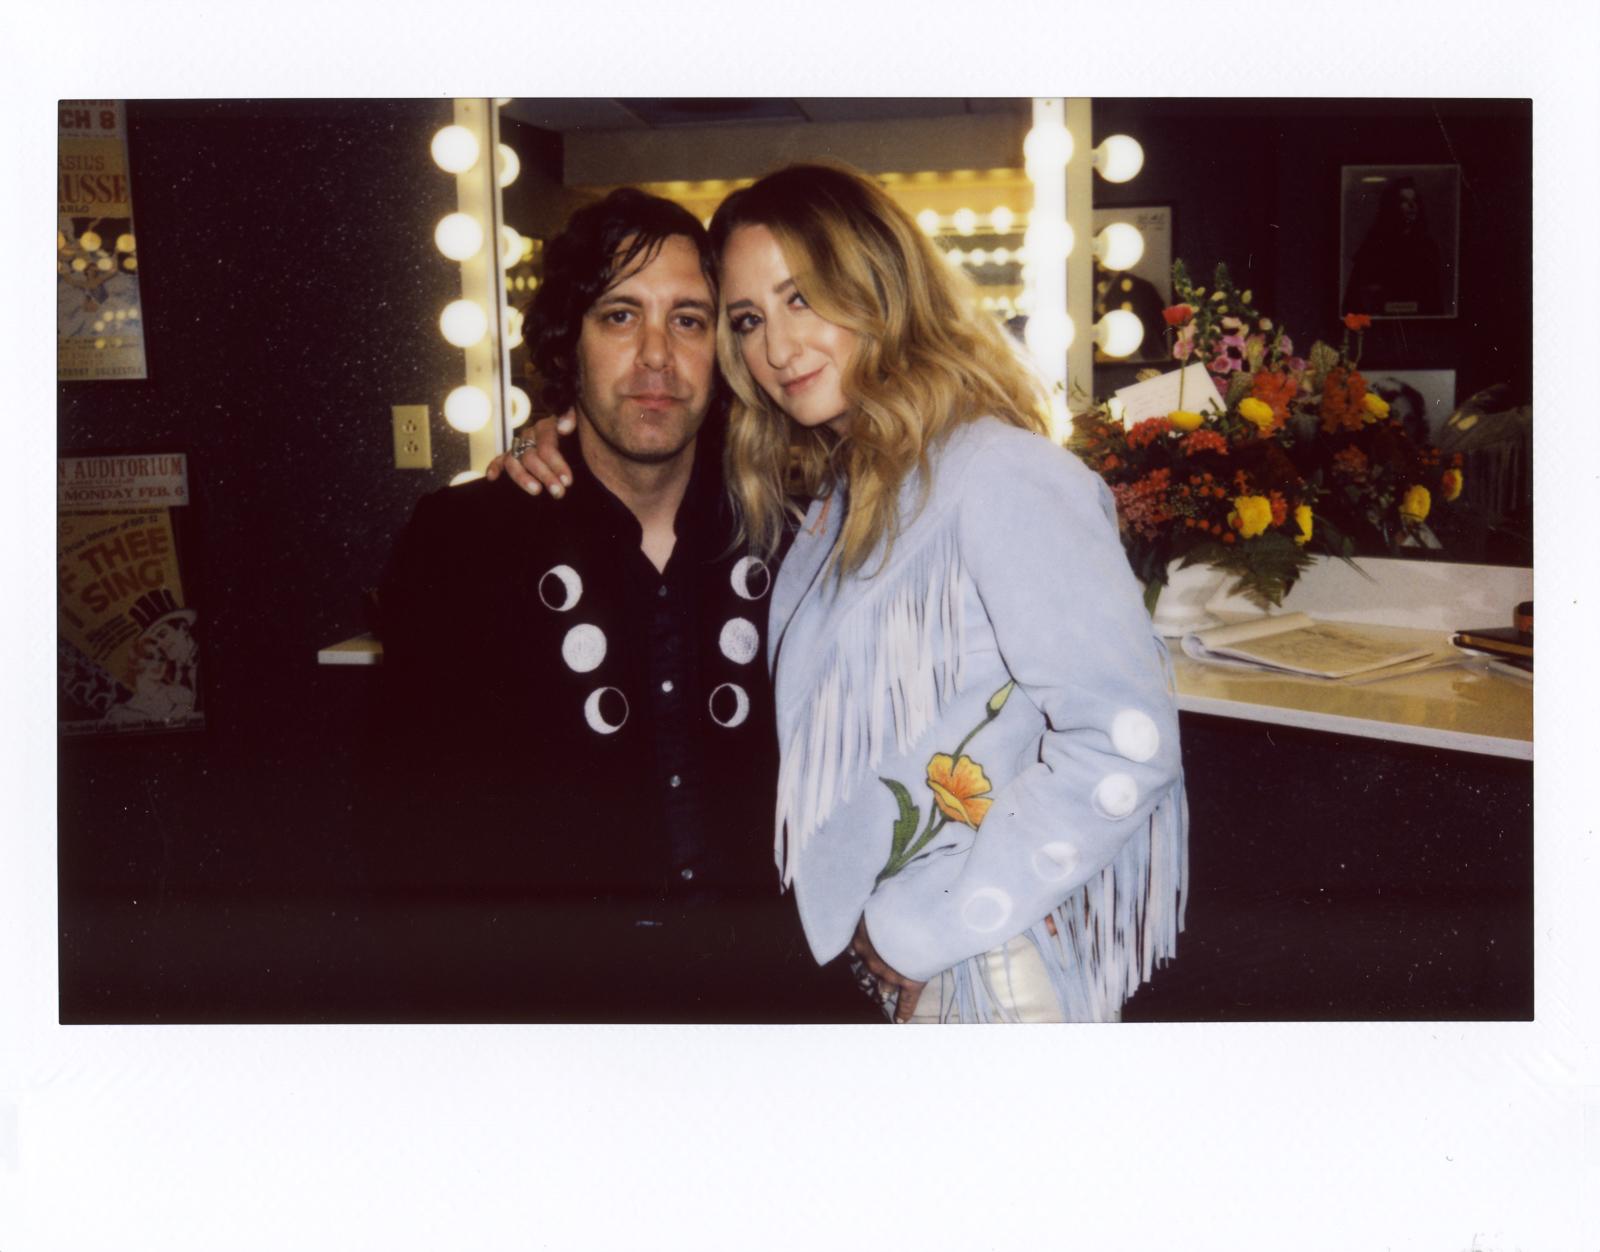 Jeremy and Margo backstage